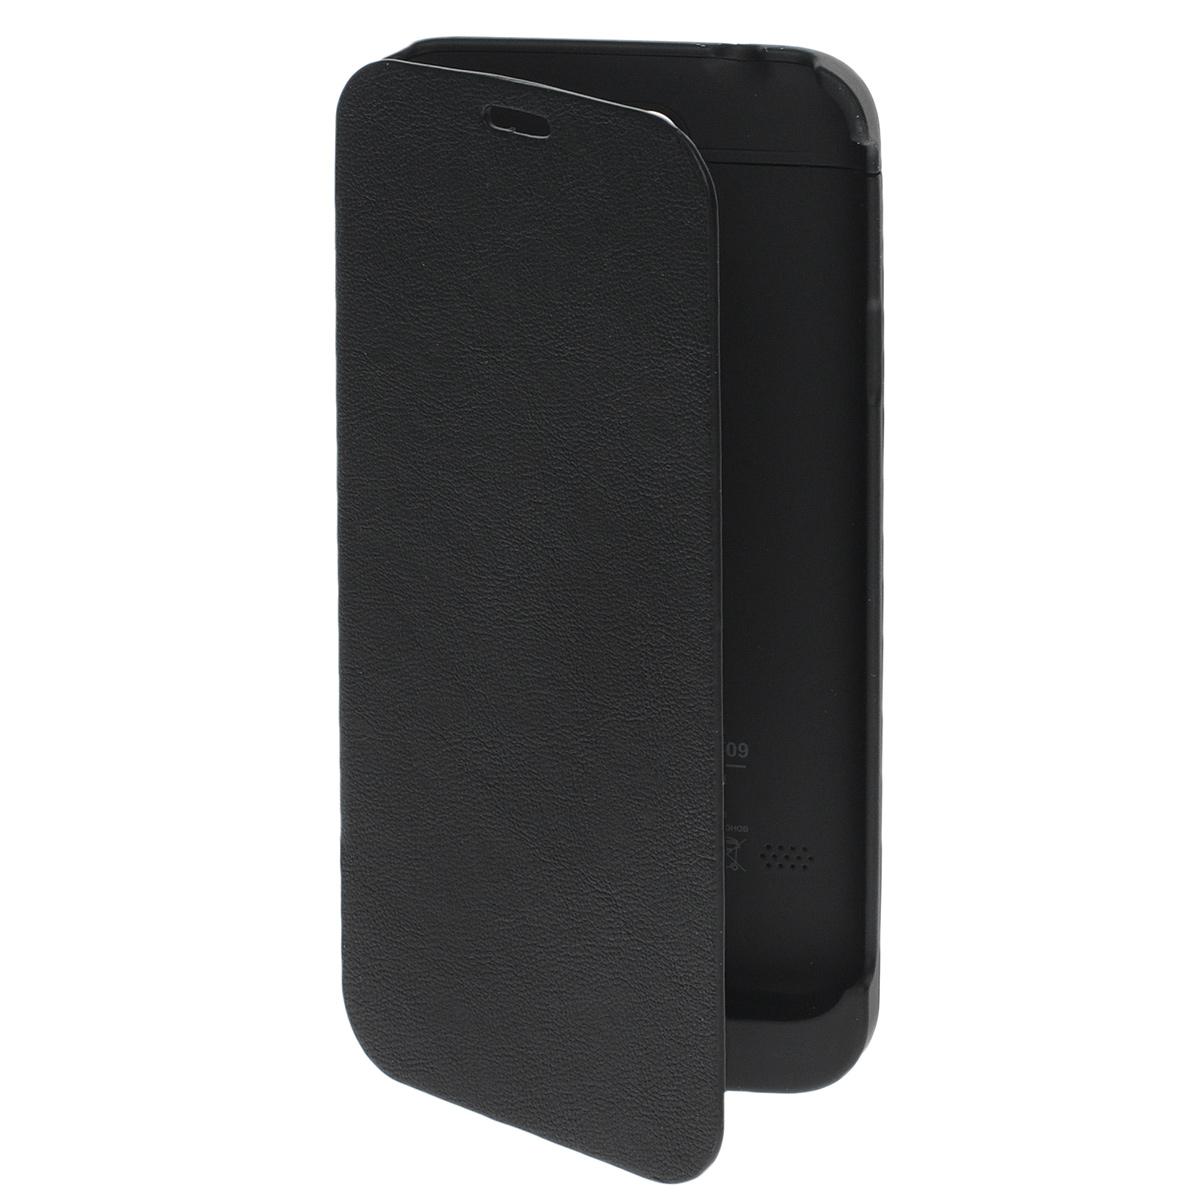 EXEQ HelpinG-SF09 чехол-аккумулятор для Samsung Galaxy S5, Black (3300 мАч, флип-кейс) цена и фото